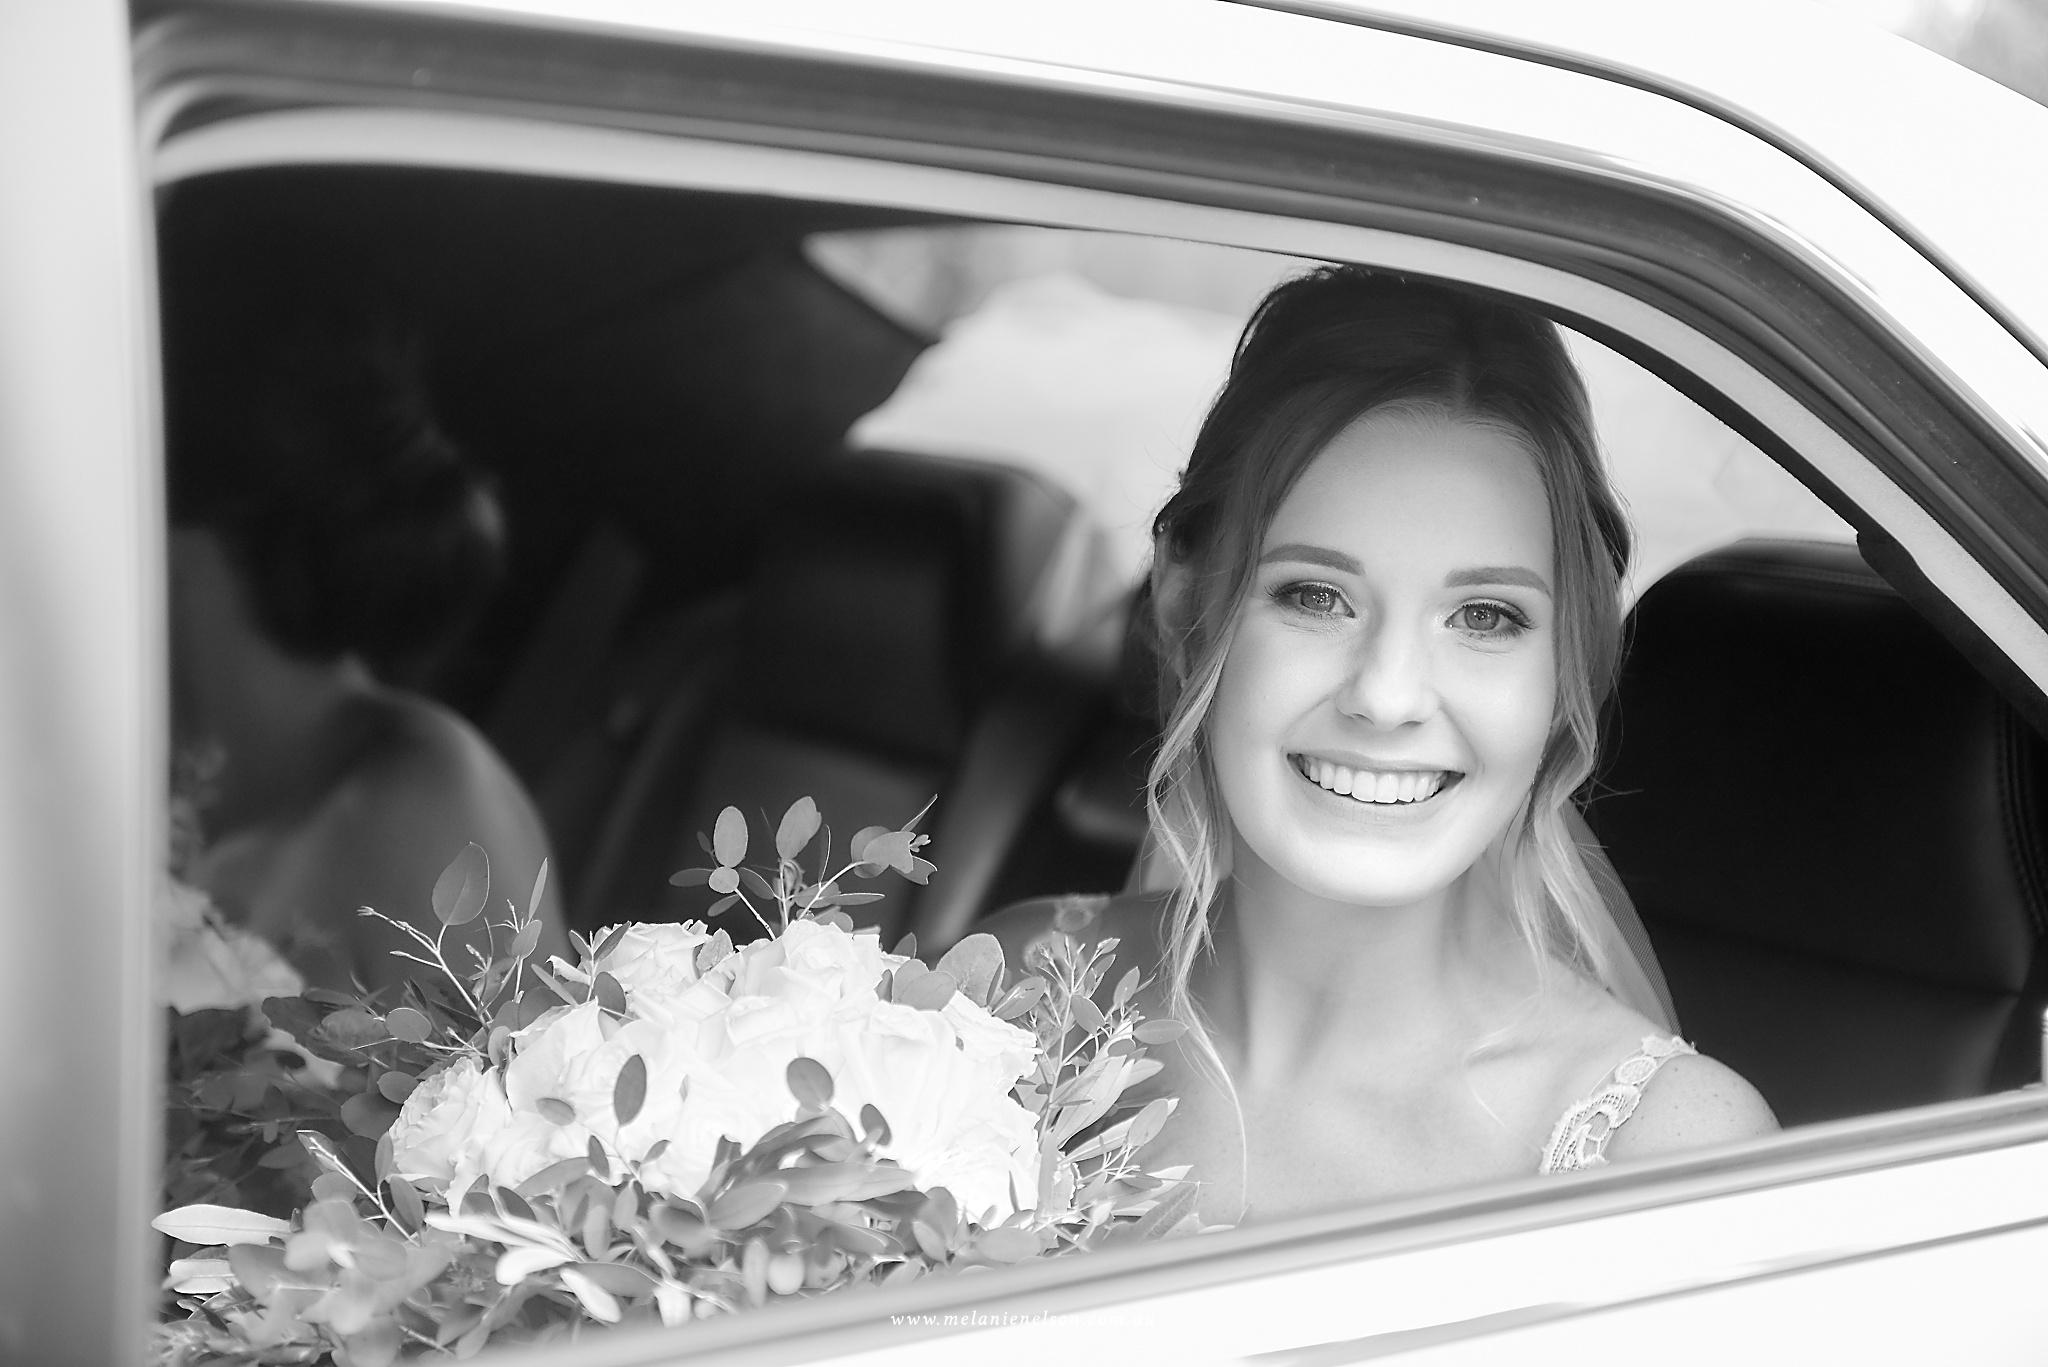 serafino_wedding_photography_0025.jpg